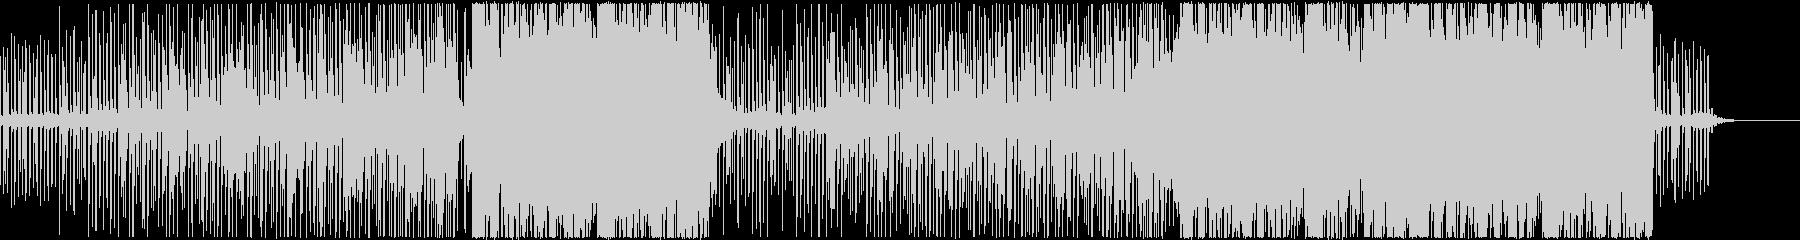 Future Bassぽいインスト曲の未再生の波形